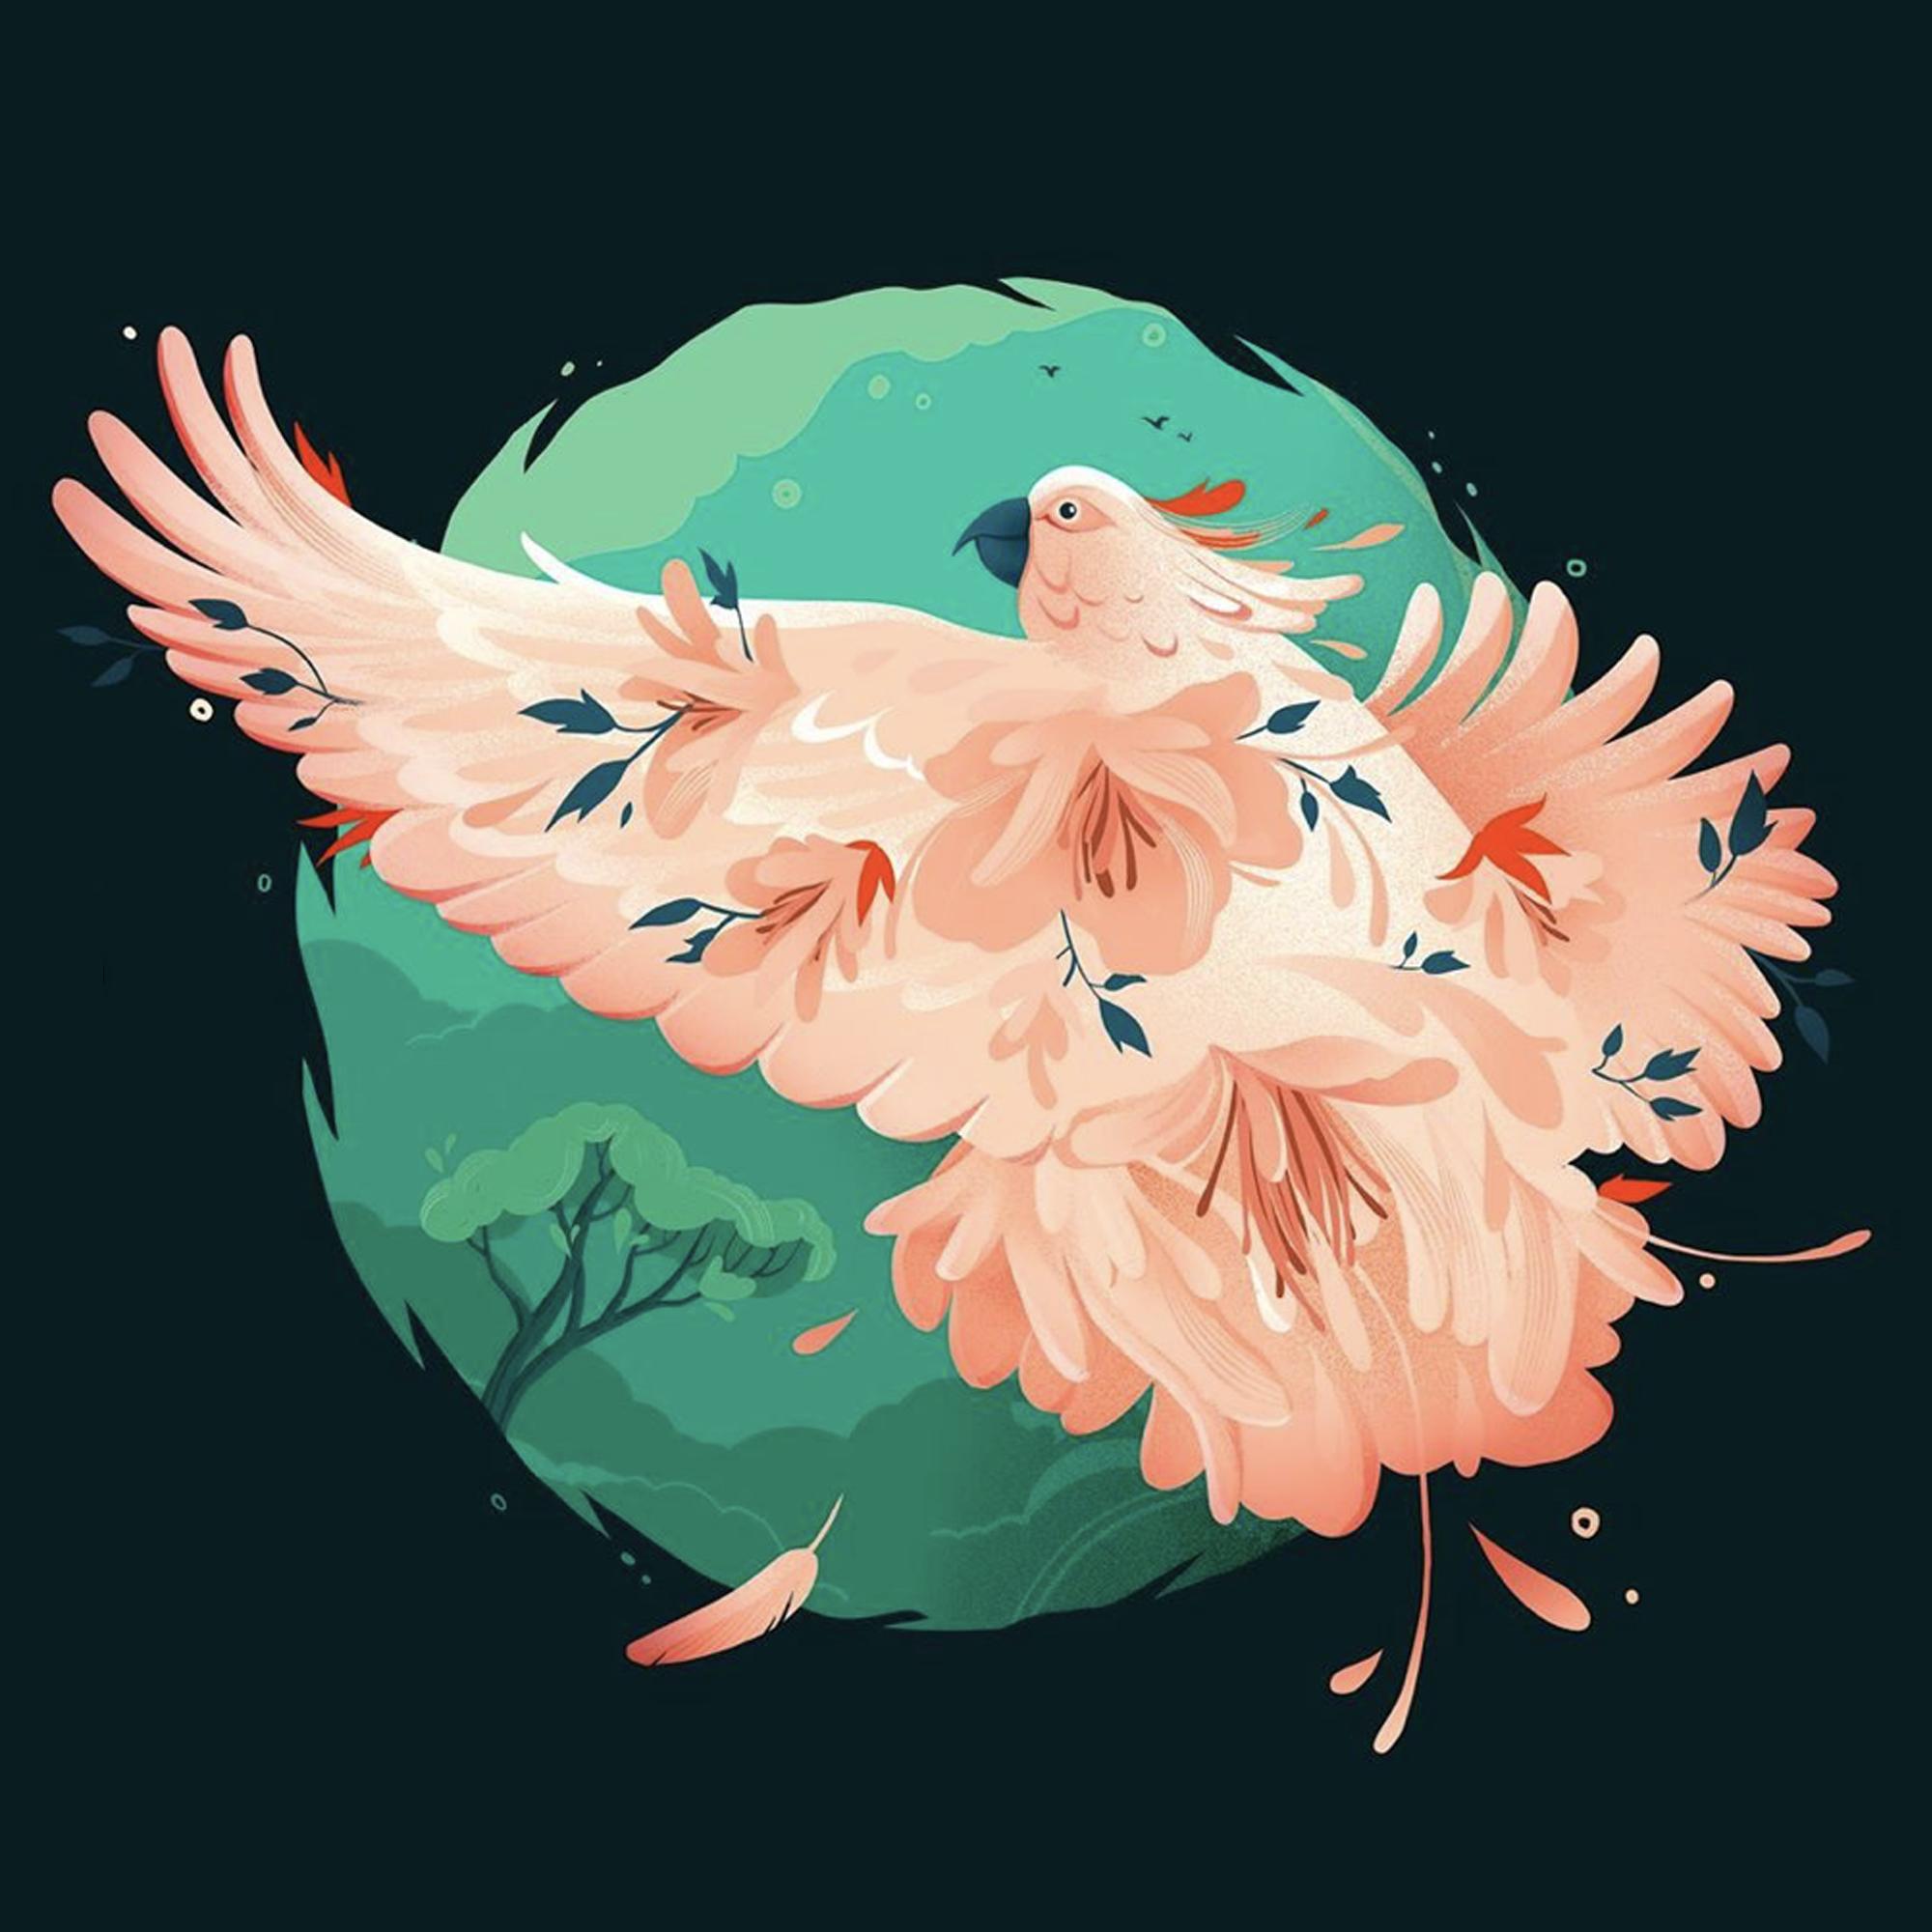 flying bird illustration